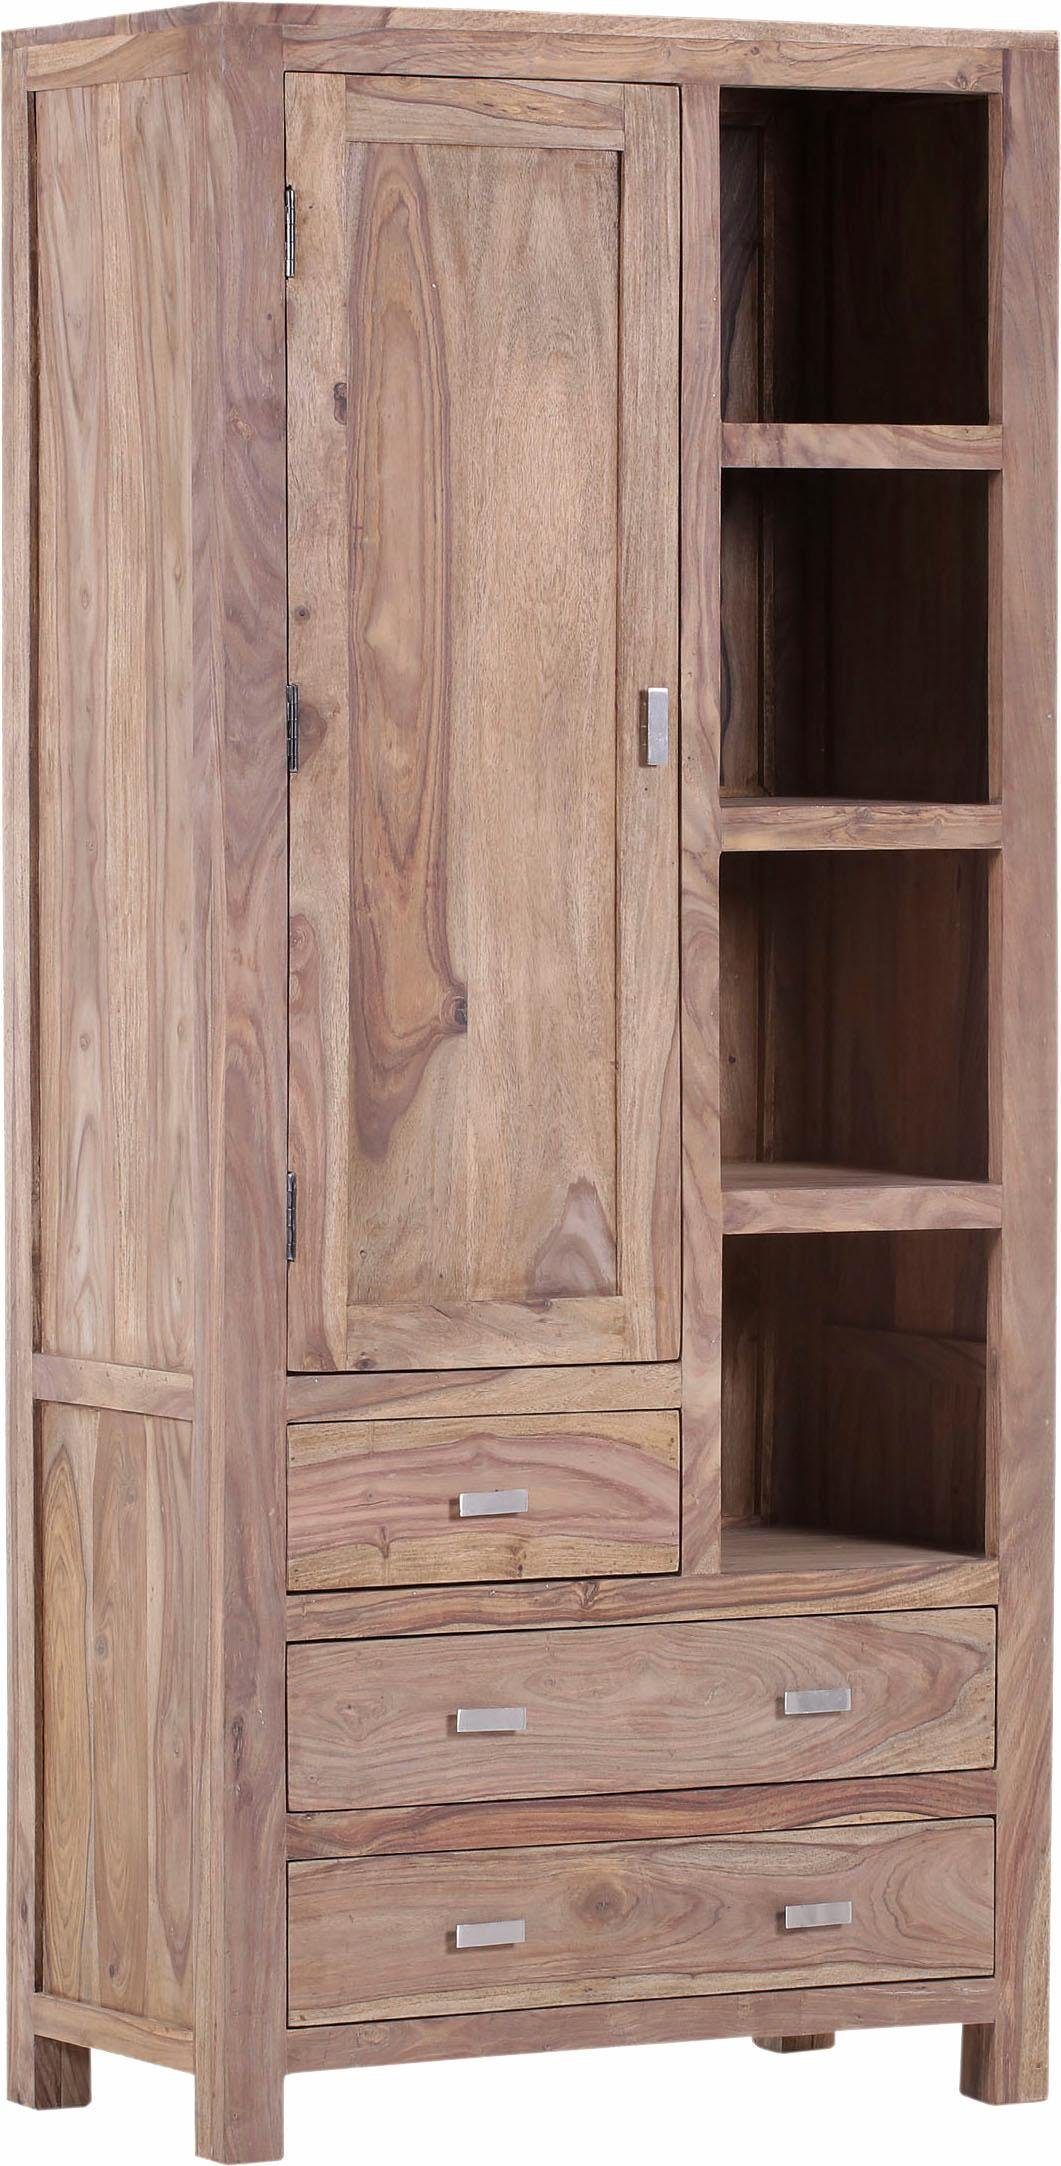 Gutmann Factory Vitrine »Inka« aus massivem Sheesham Holz, Höhe 190 cm